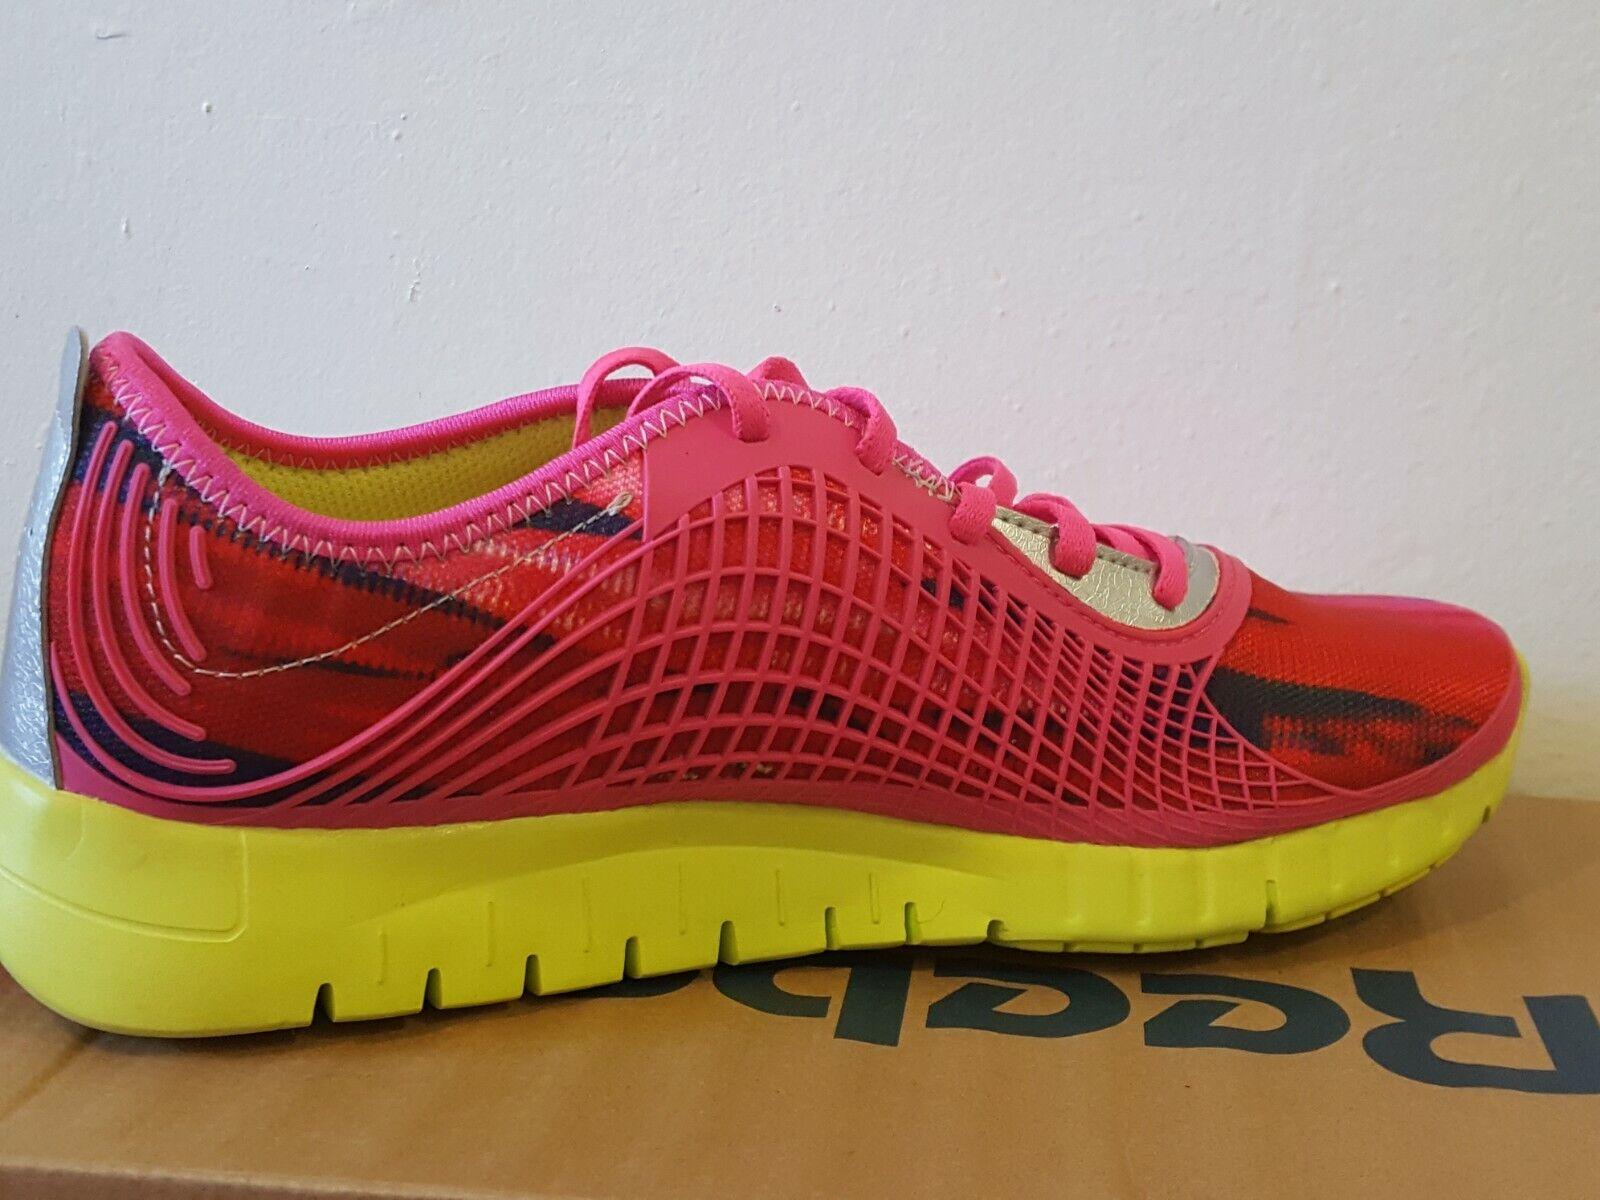 fcb85fcdcc ... Reebok Z Goddess Goddess Z Glitch M44667 rosado amarillo-Plateado para Mujer  Zapatos Para Correr ...